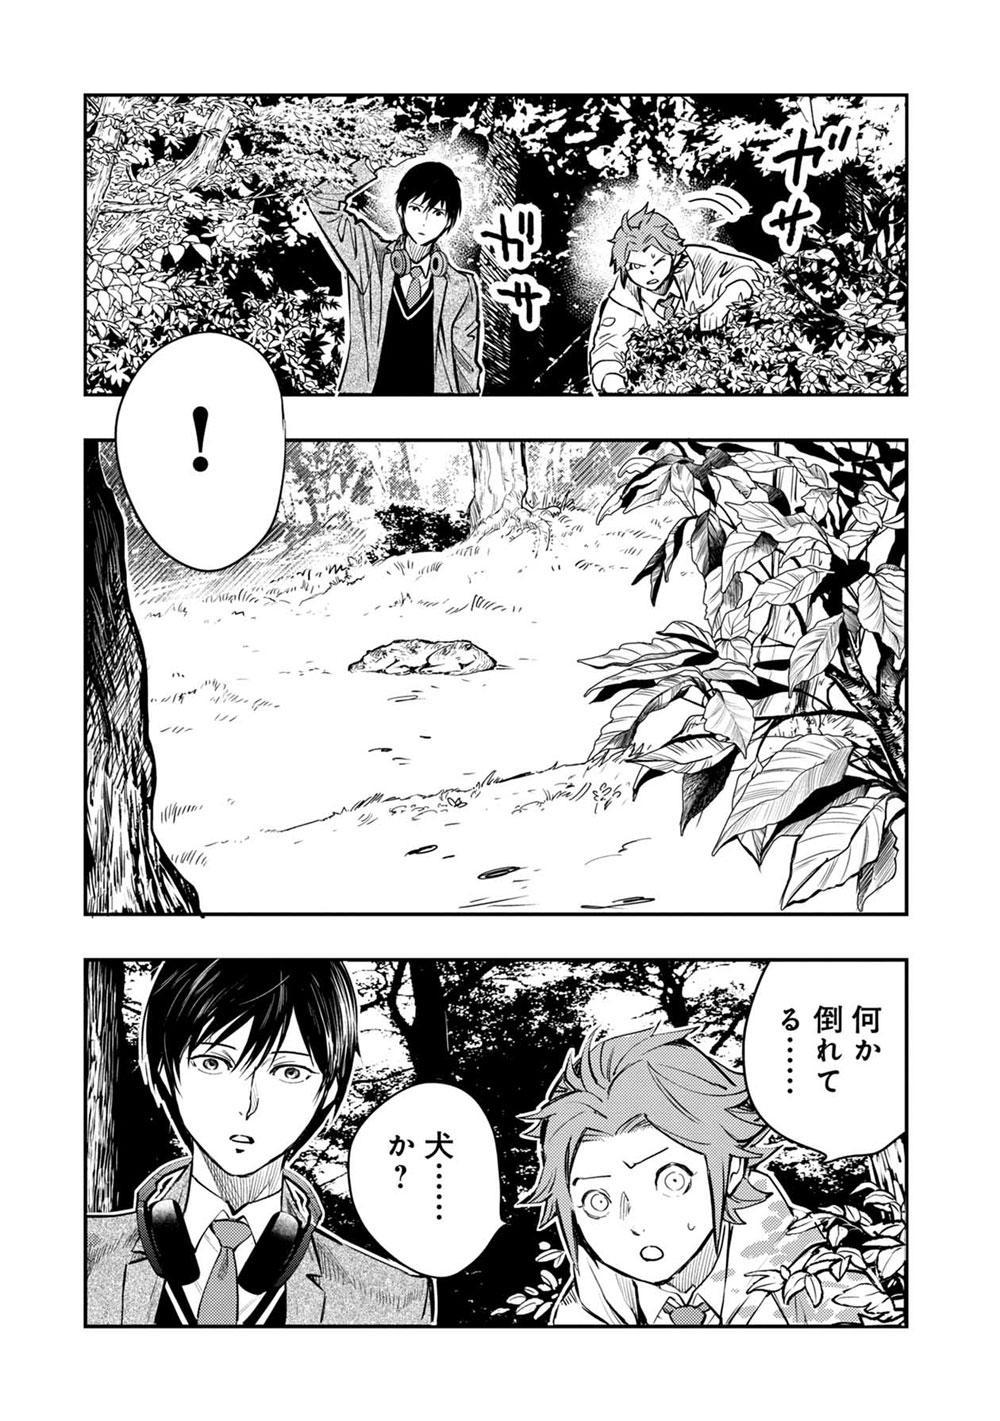 inugami_re_002_011.jpg